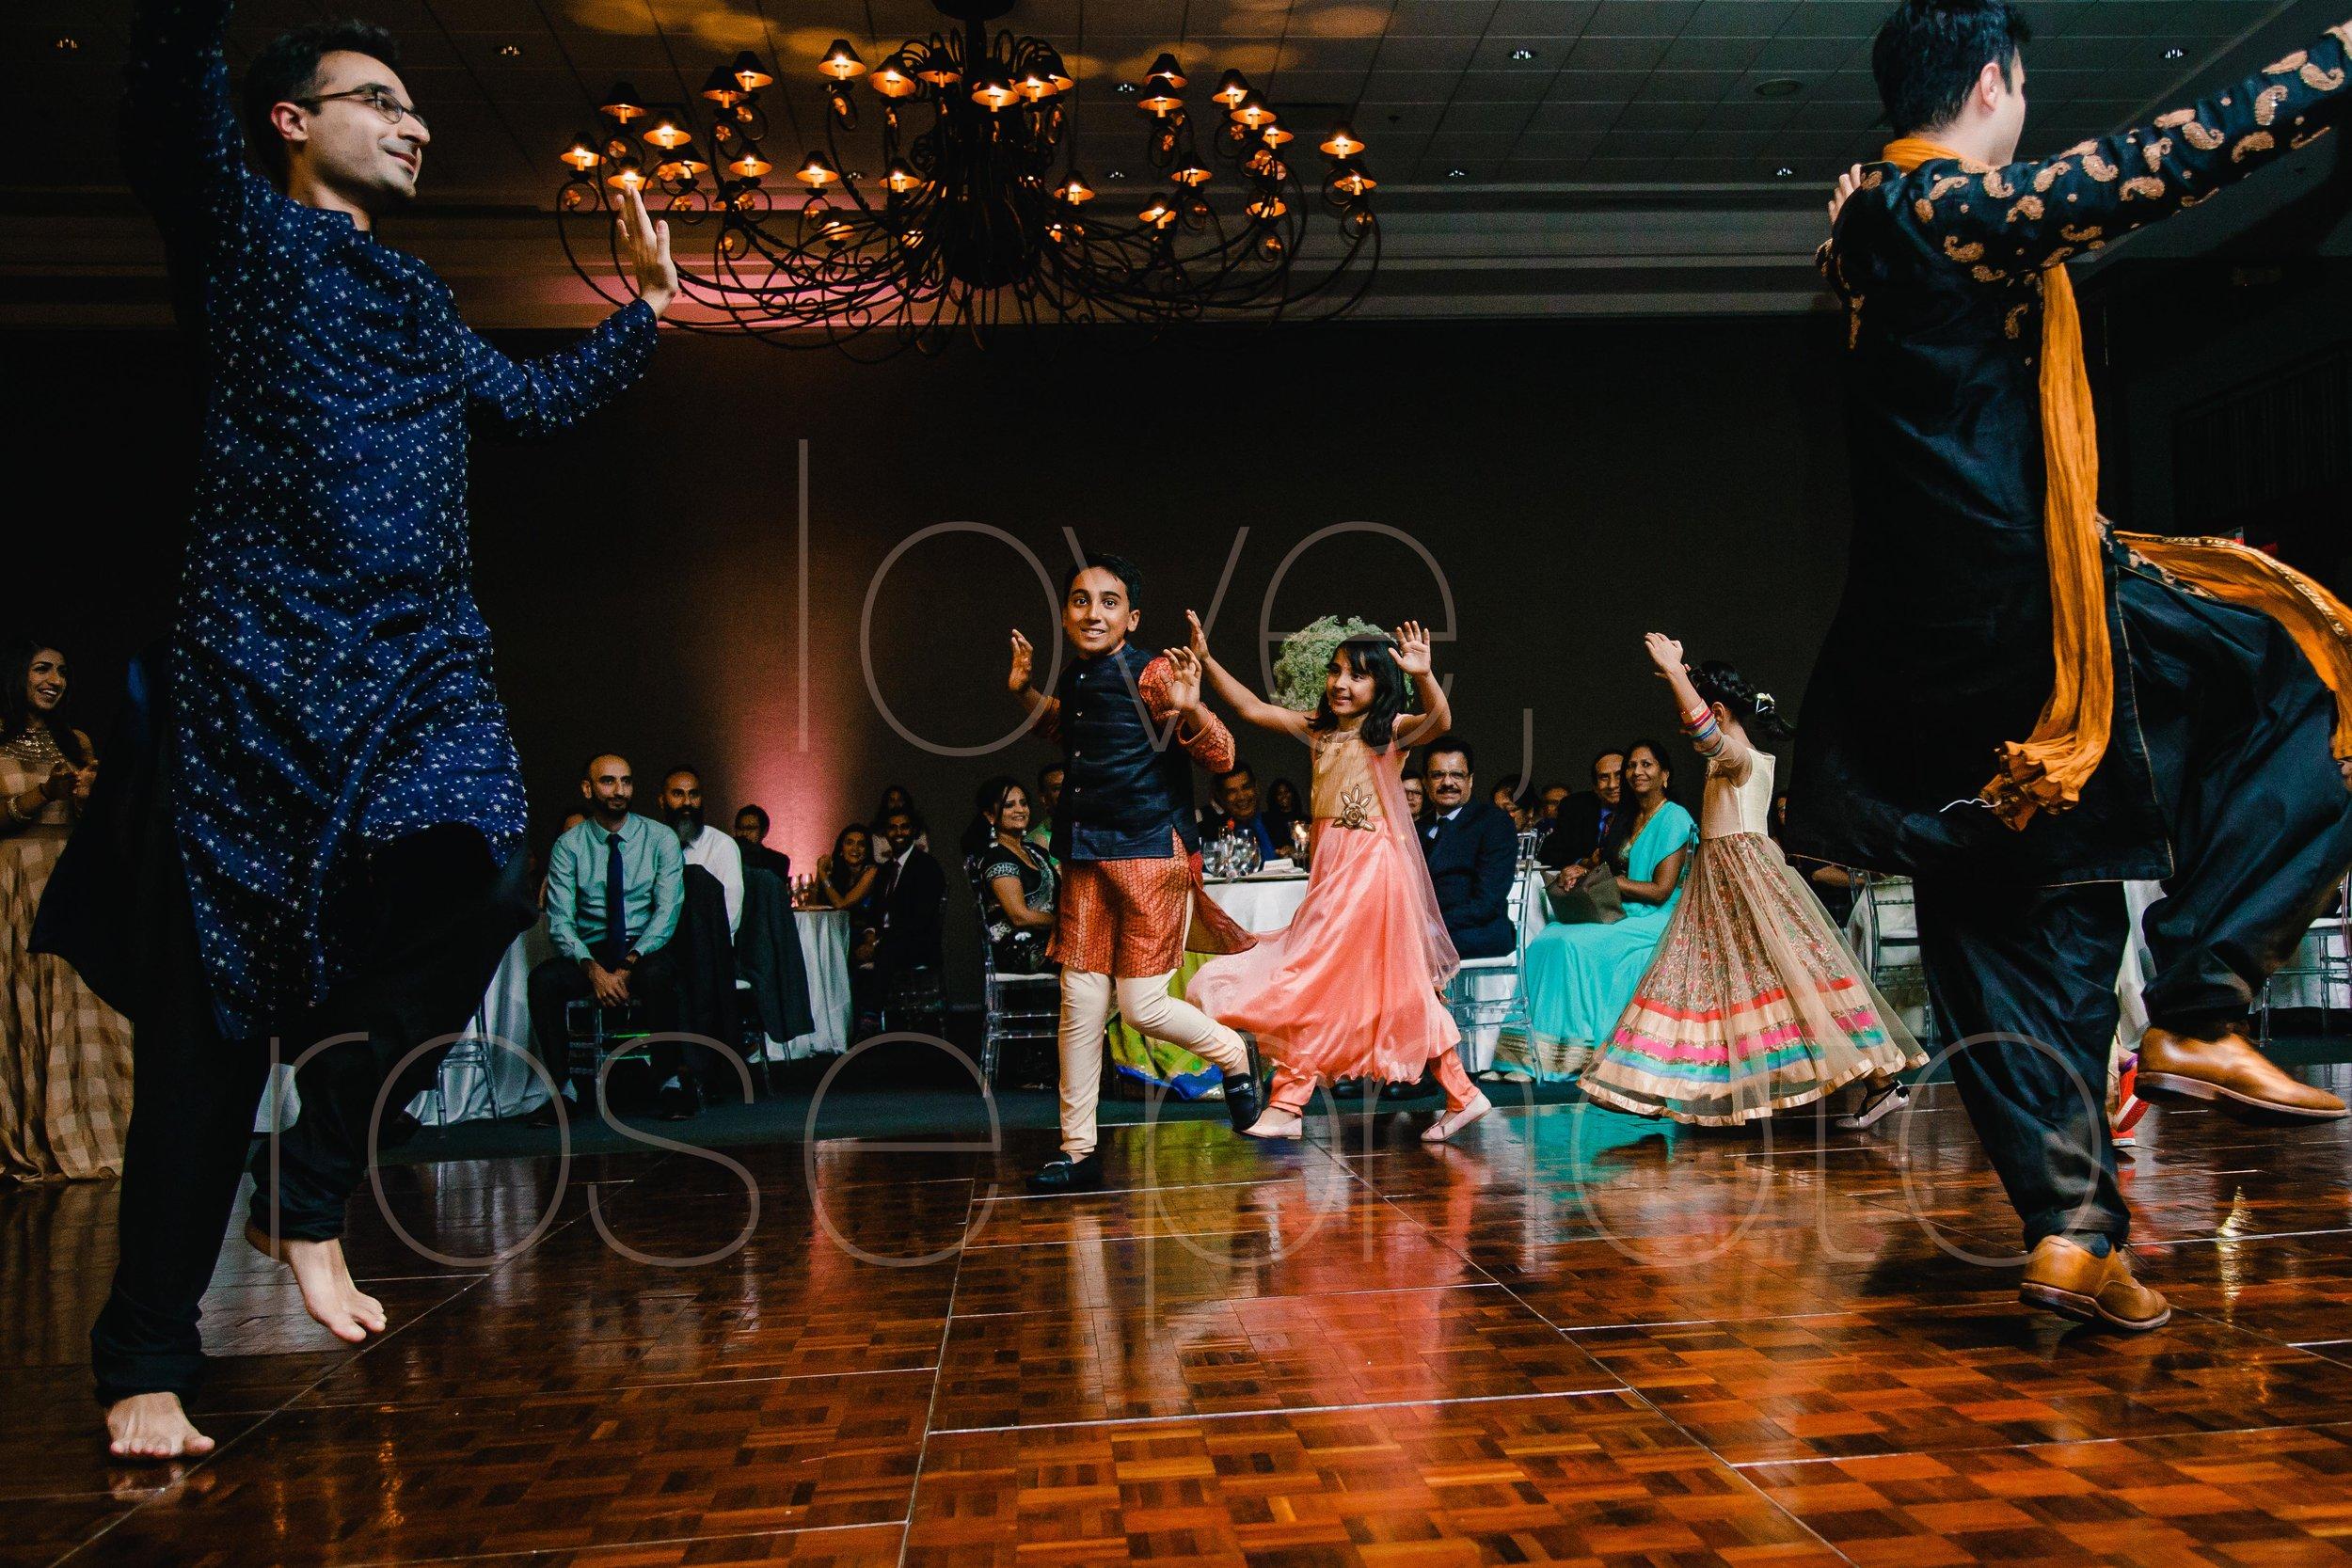 Chicago Indian Wedding best photography lifestyle wedding portrait luxury wedding-60.jpg